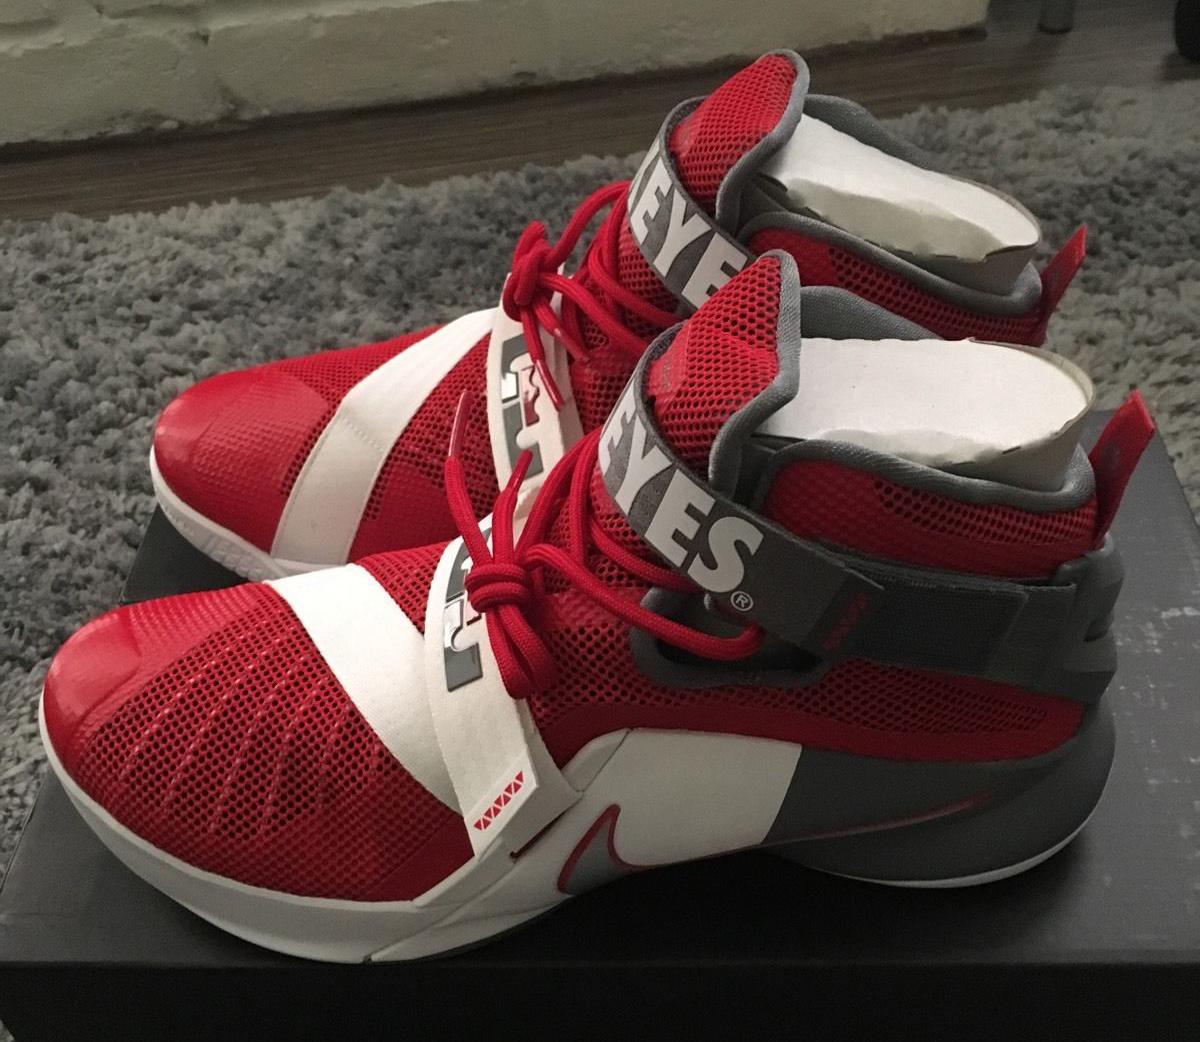 c641019edb25 Ohio State Fans Will Appreciate These Nike LeBrons